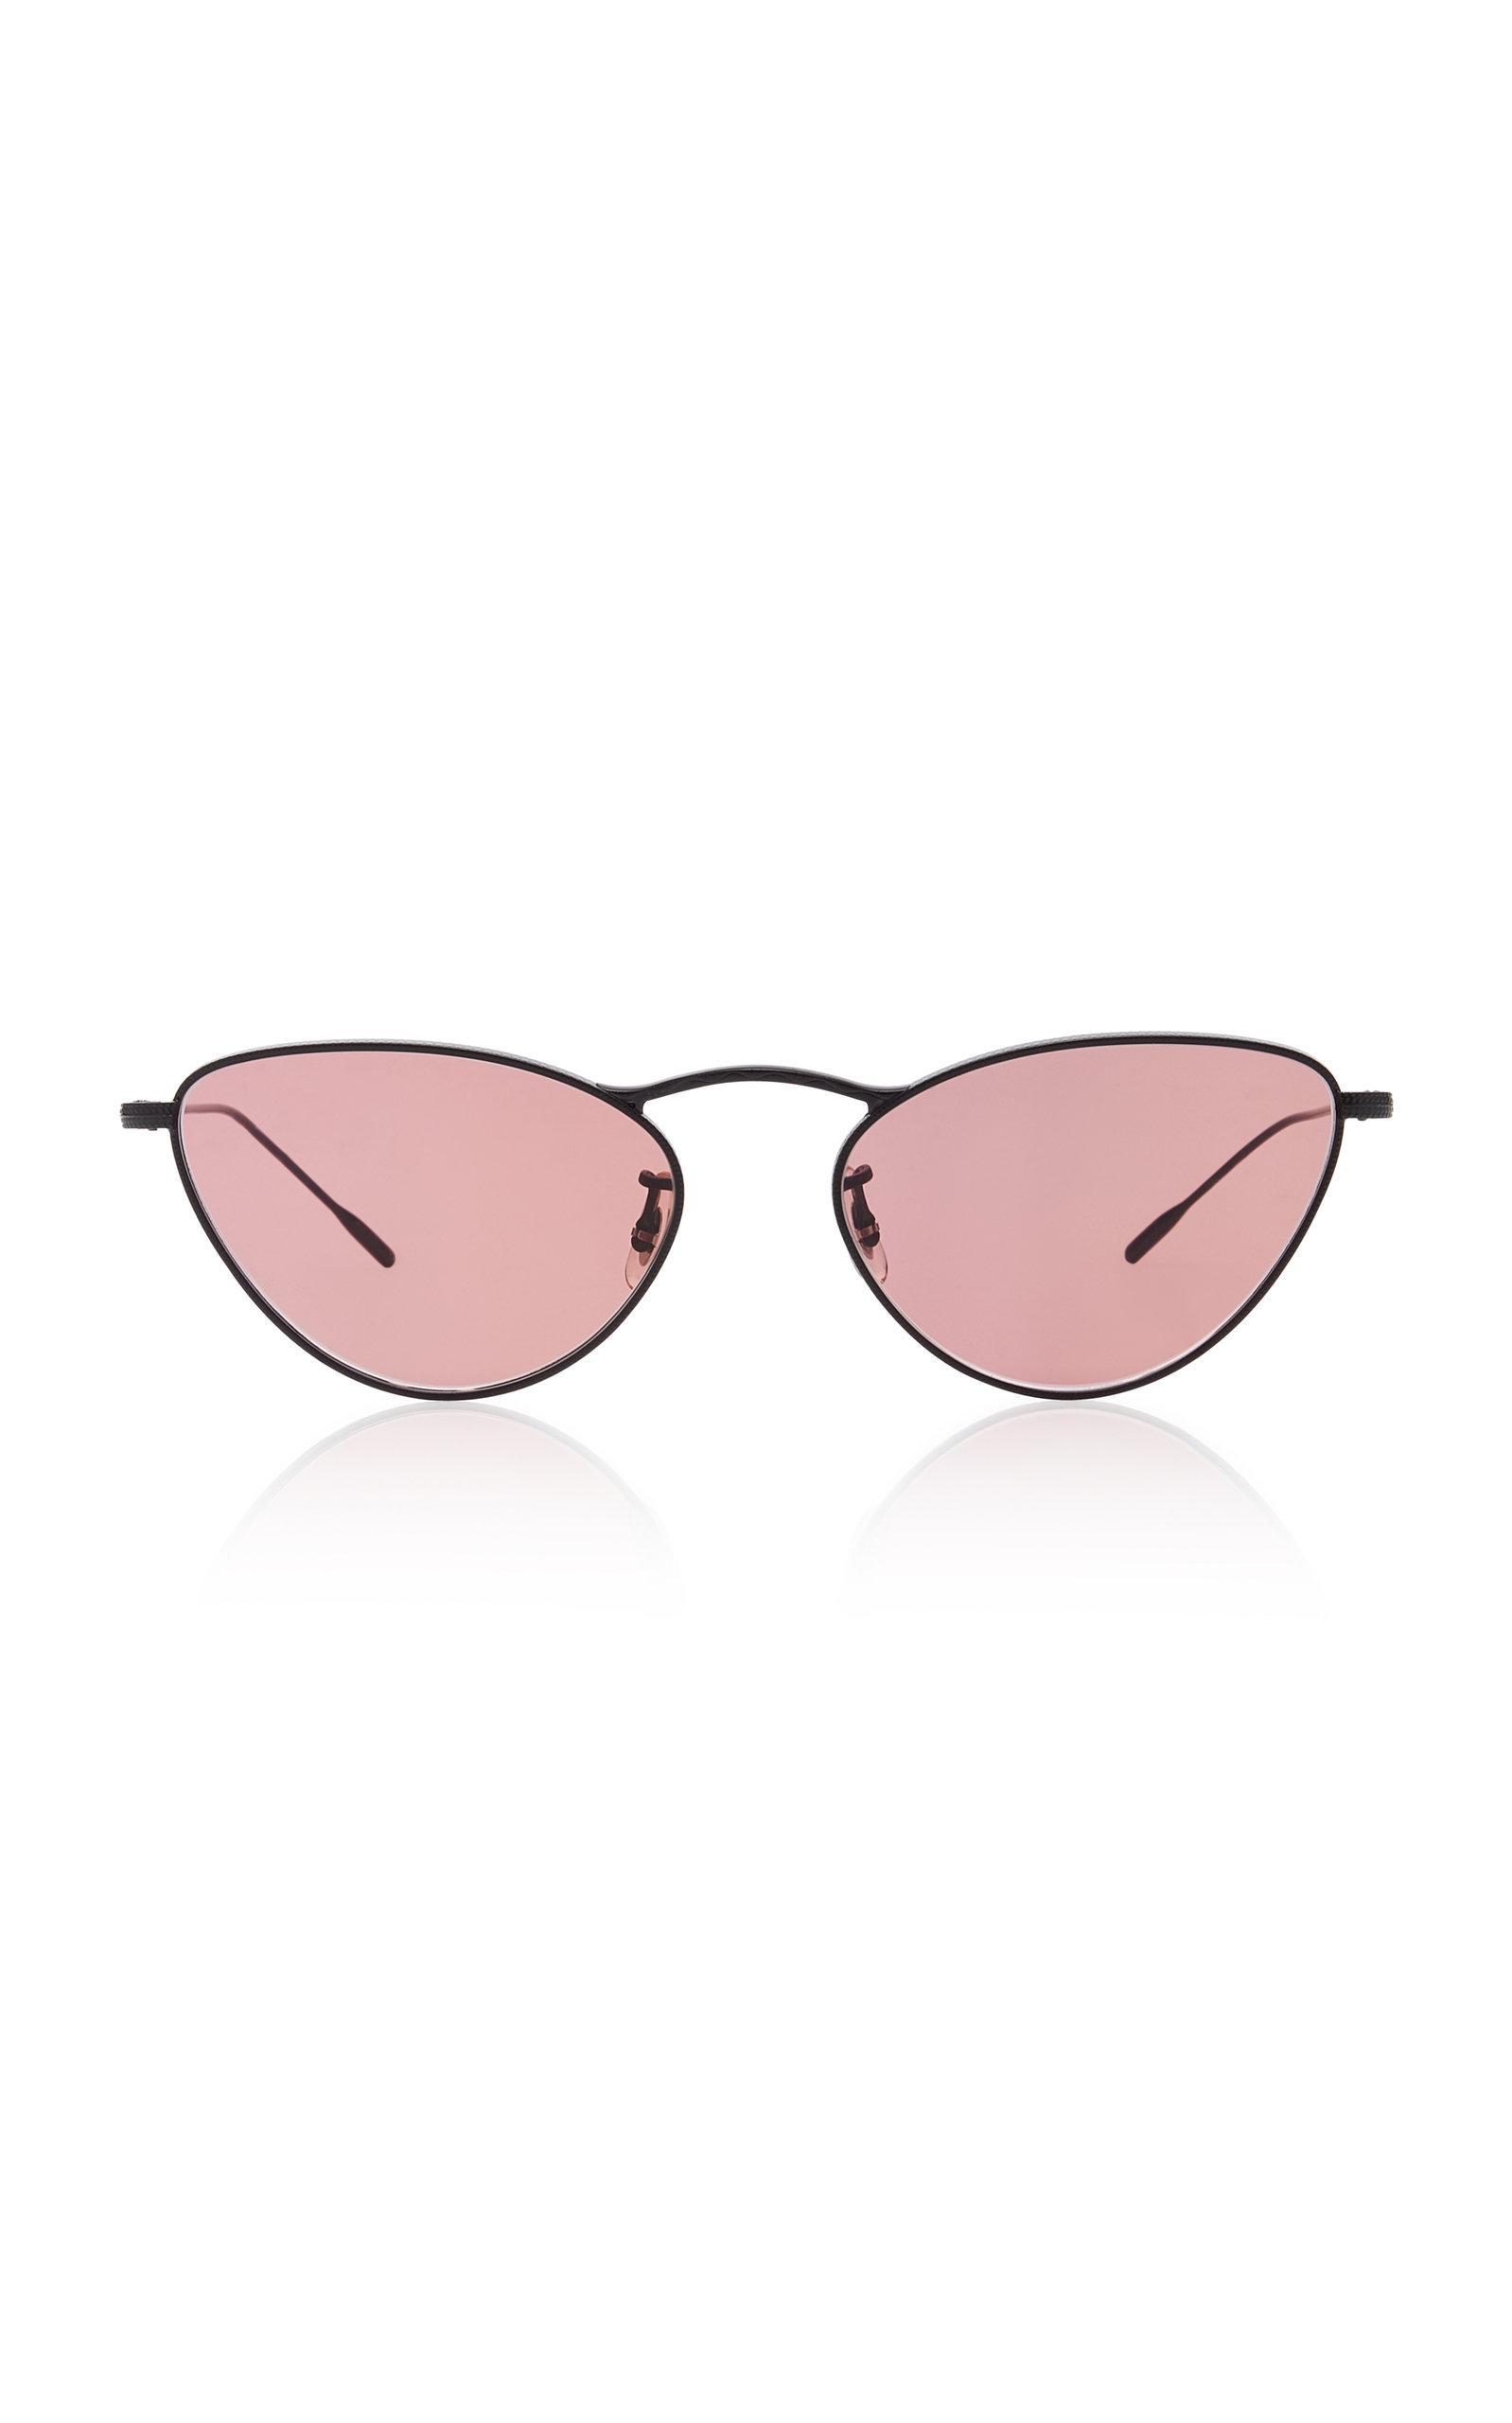 f22cbc861051f Oliver PeoplesLelaina Cat-Eye Metal Sunglasses. CLOSE. Loading